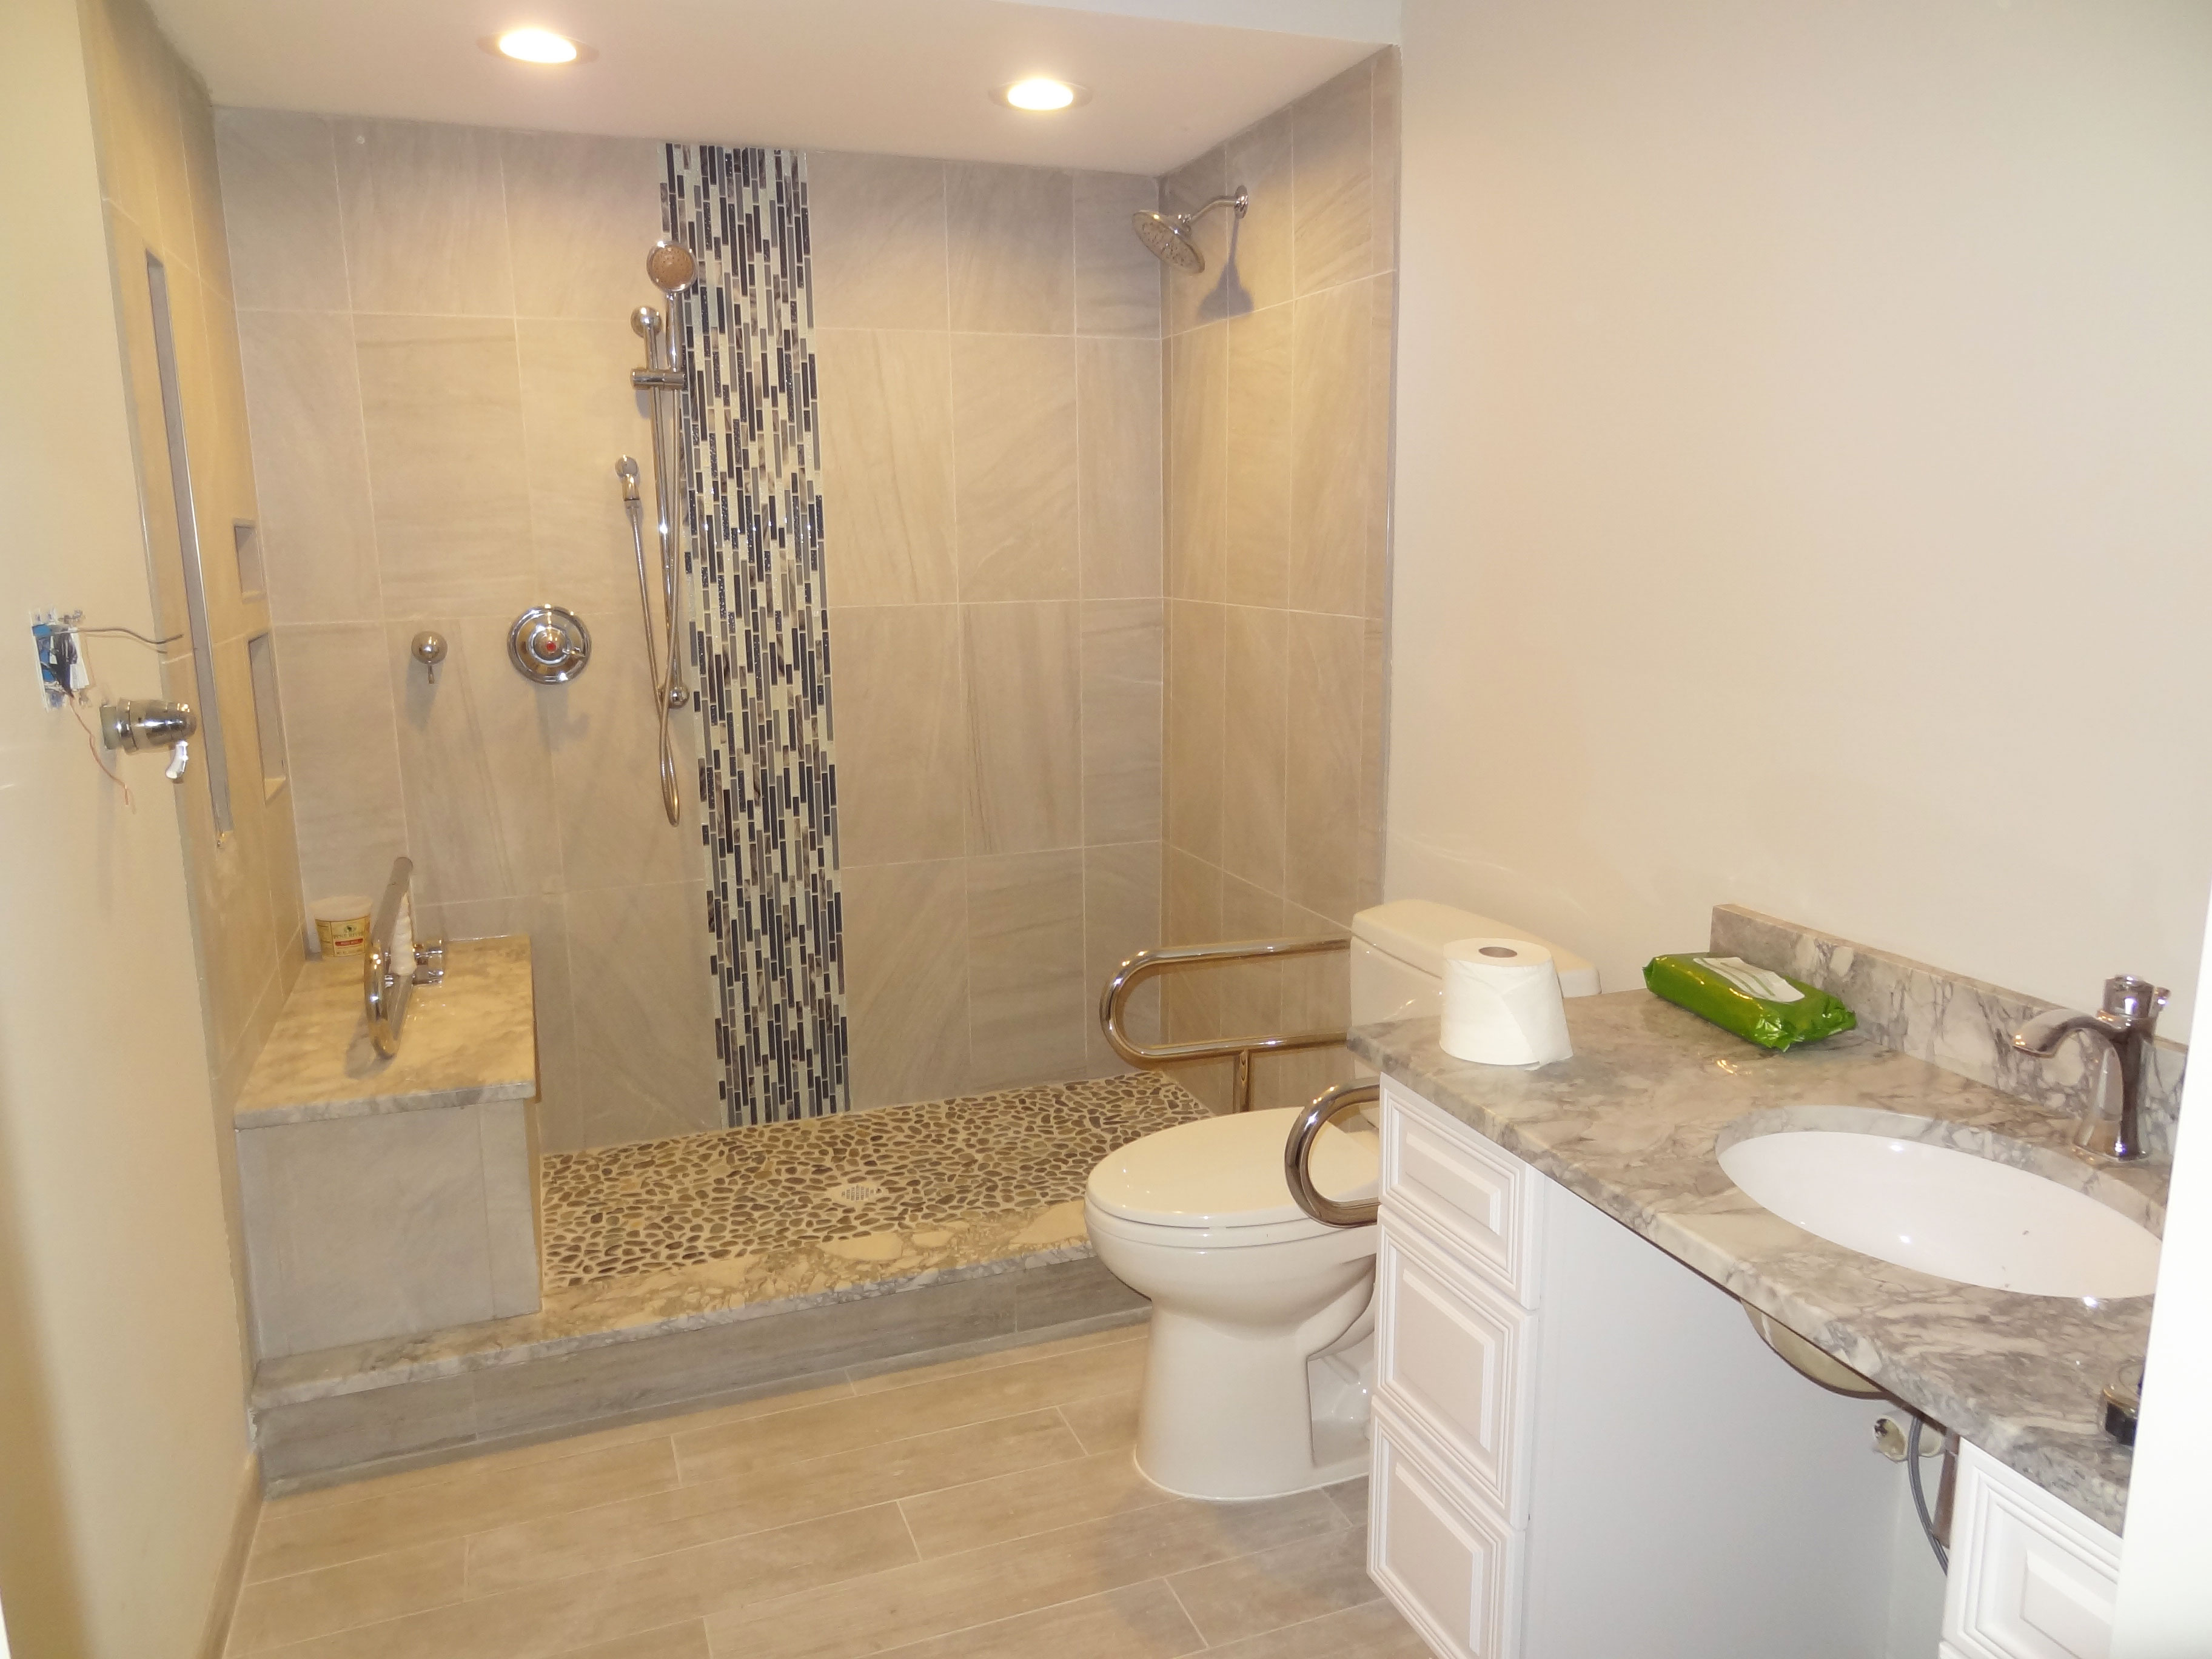 ohidesign kitchen remodeling manassas va Bathroom Remodel 4